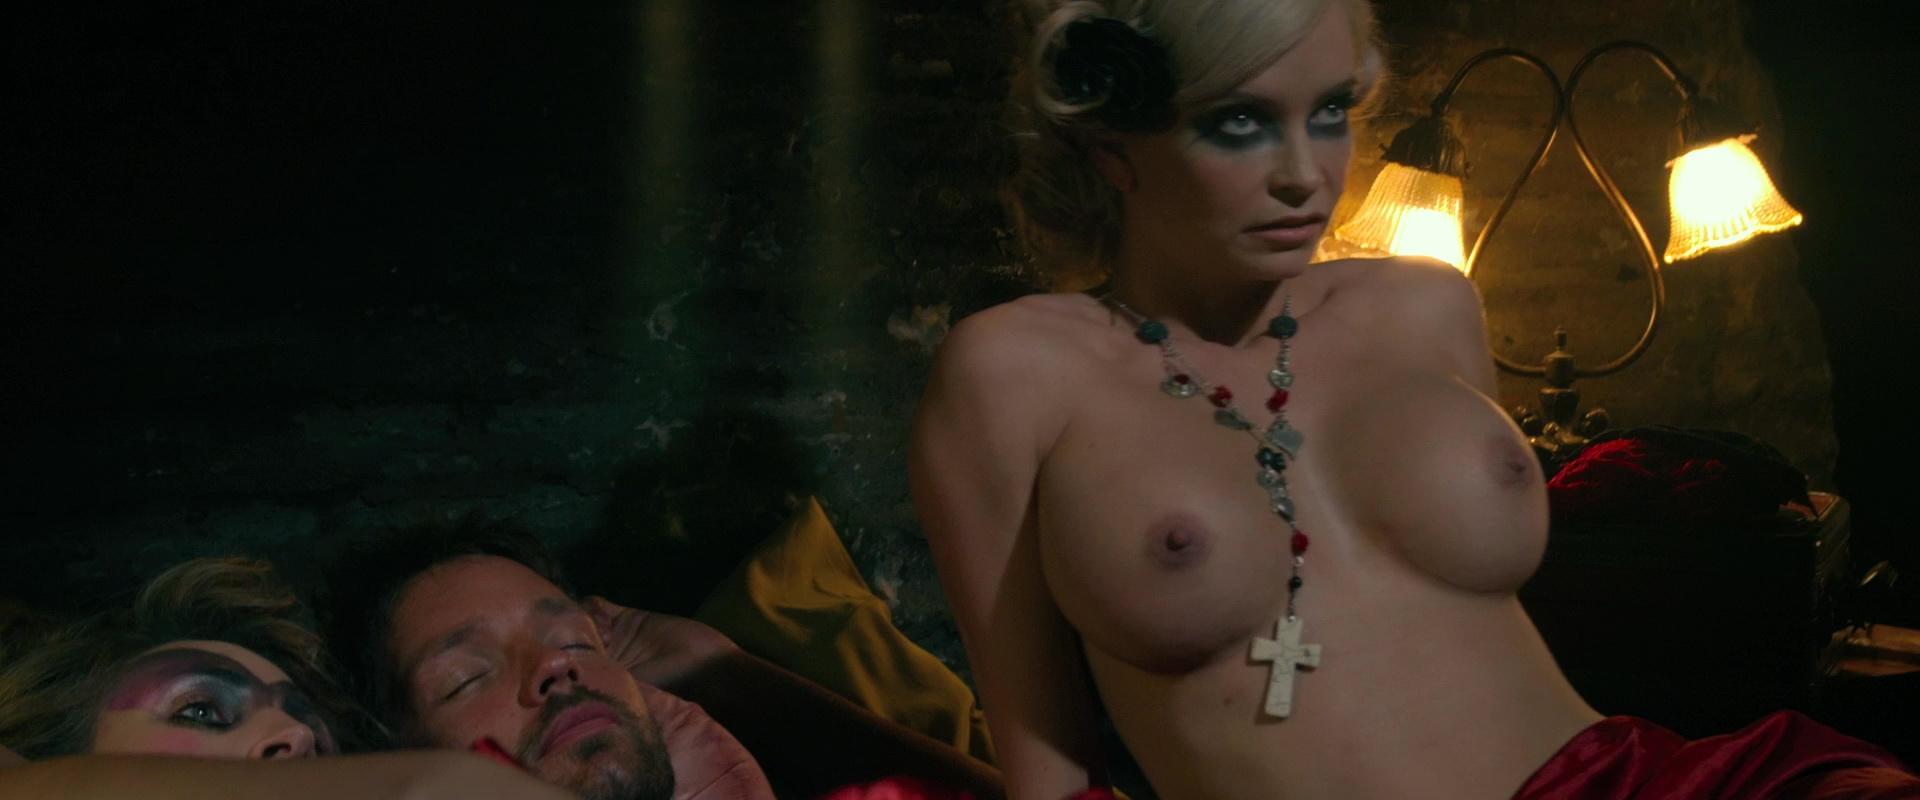 Christan nude boobs